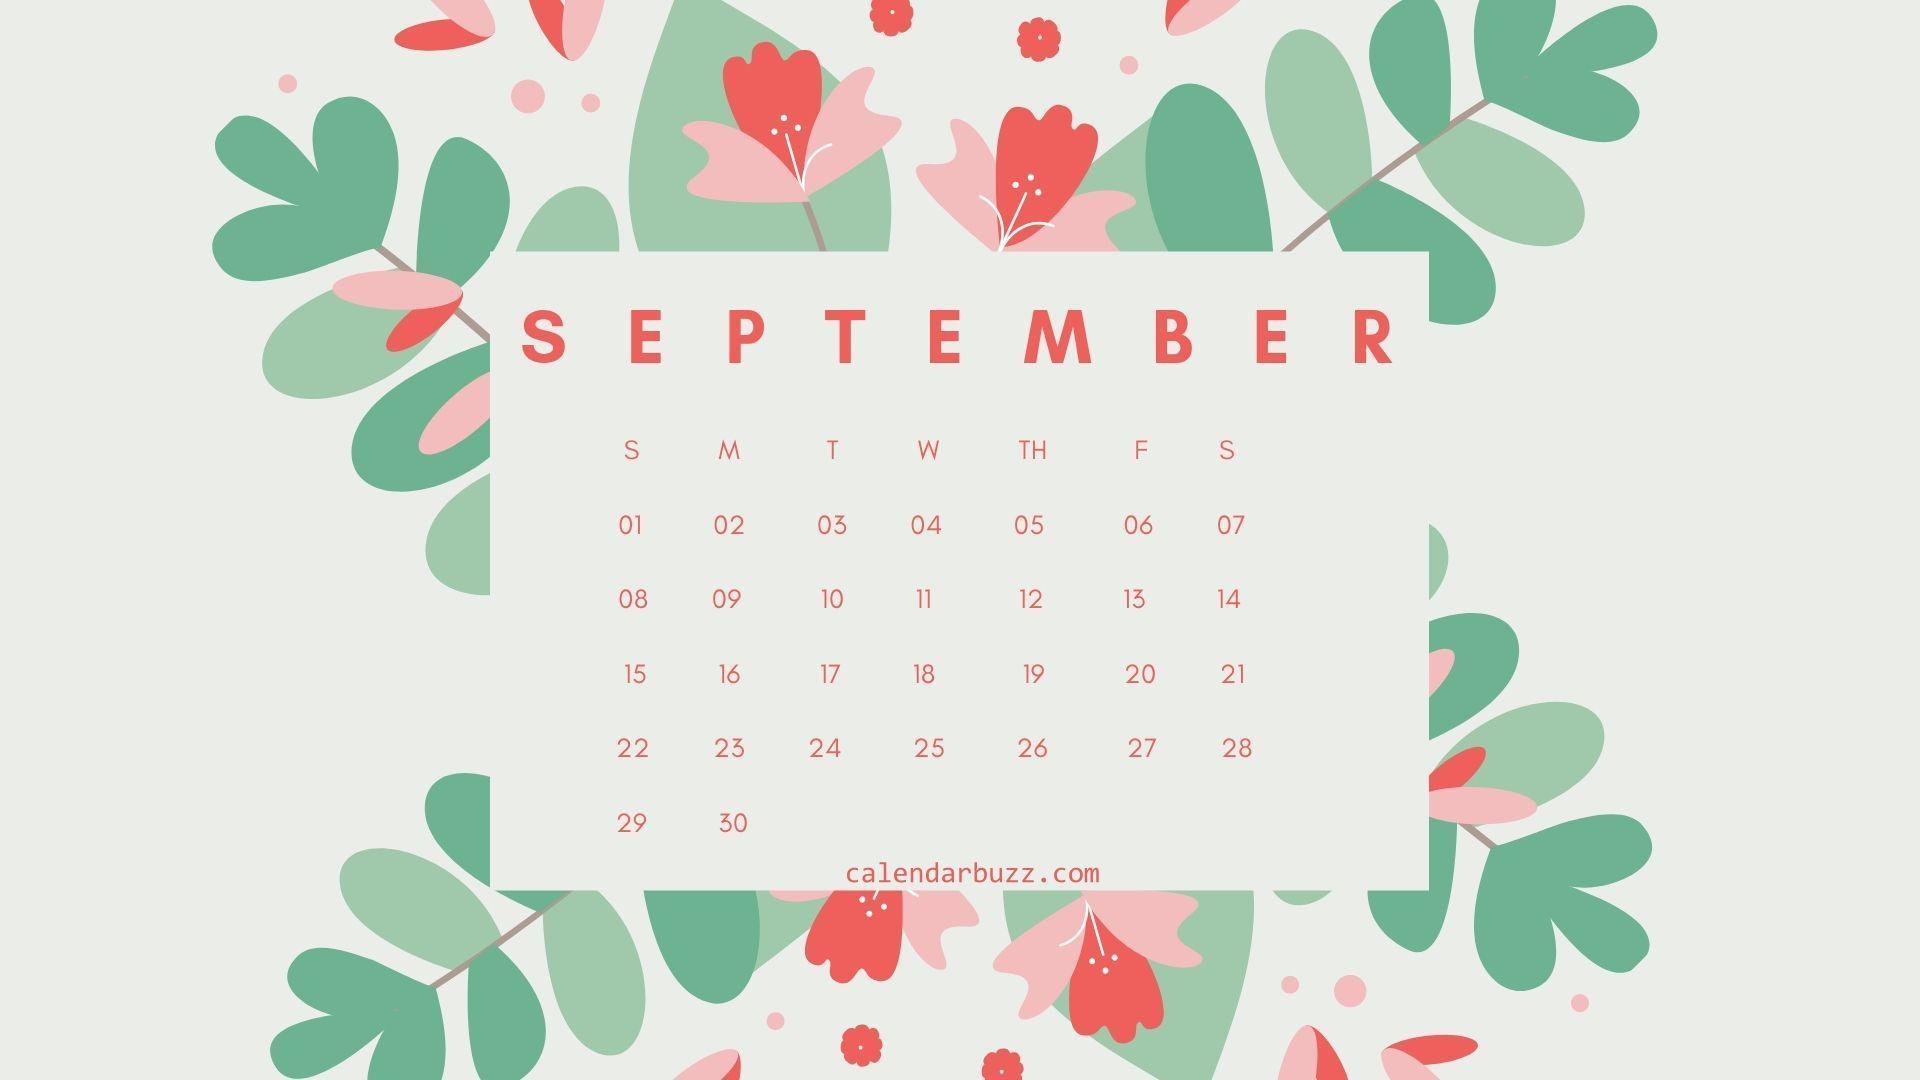 September 2019 Flower Calendar Wallpaper in 2019 Calendar 1920x1080